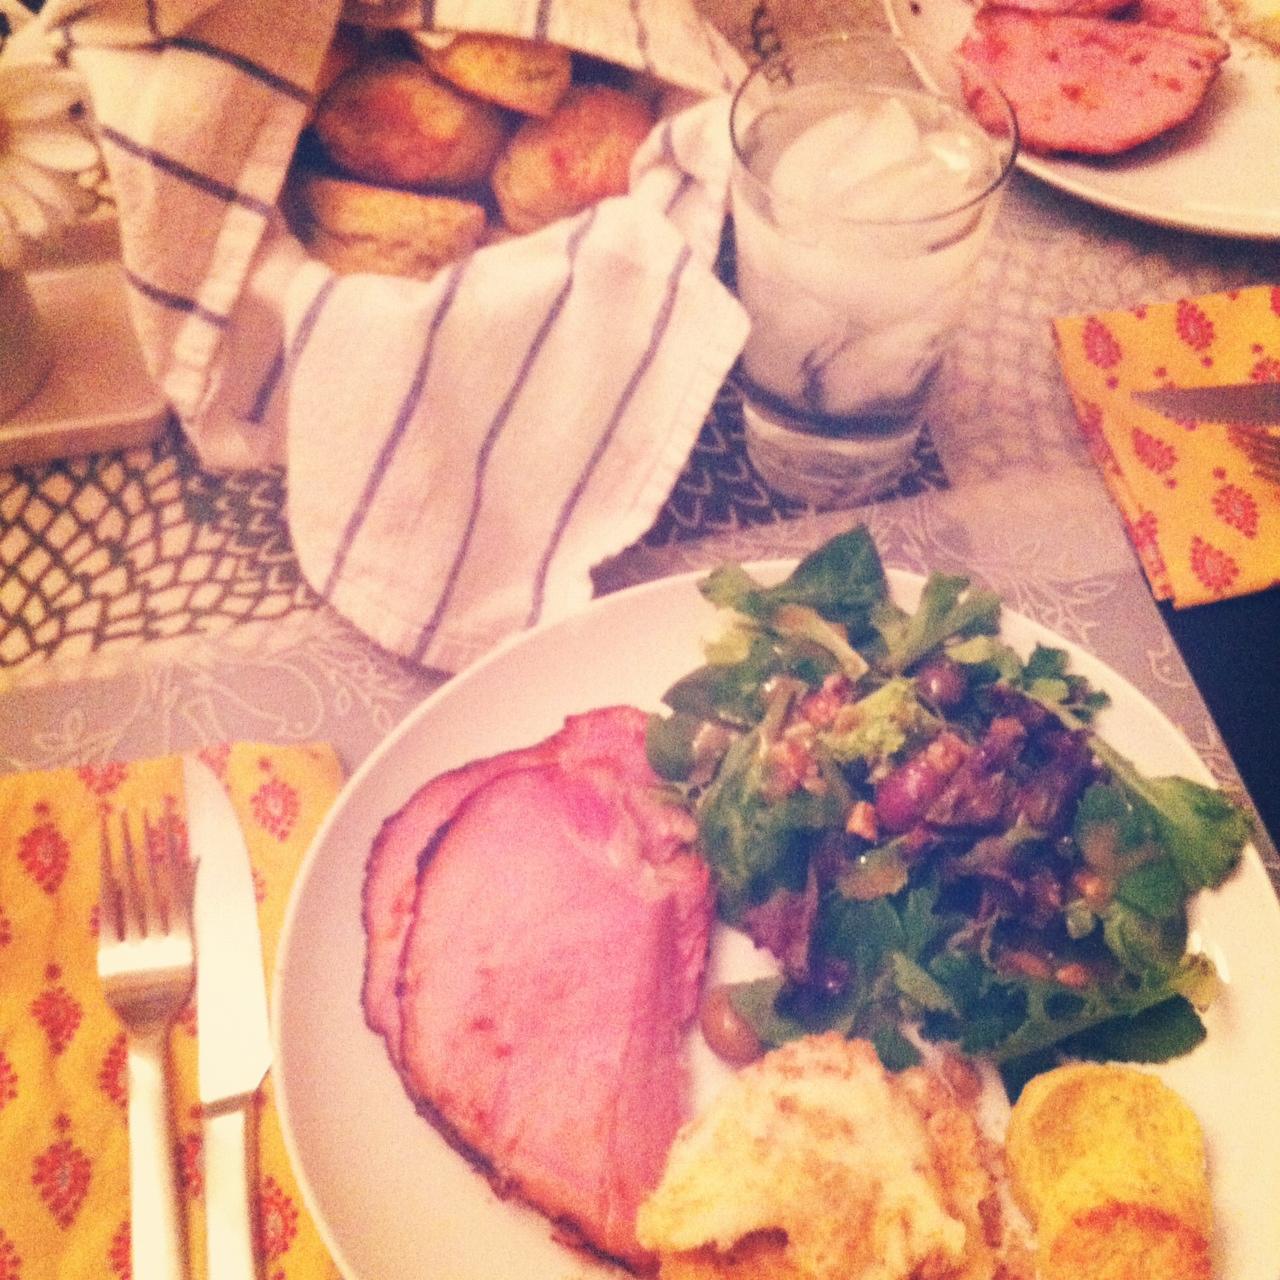 Everyday Food's April 2012 Easter Menu